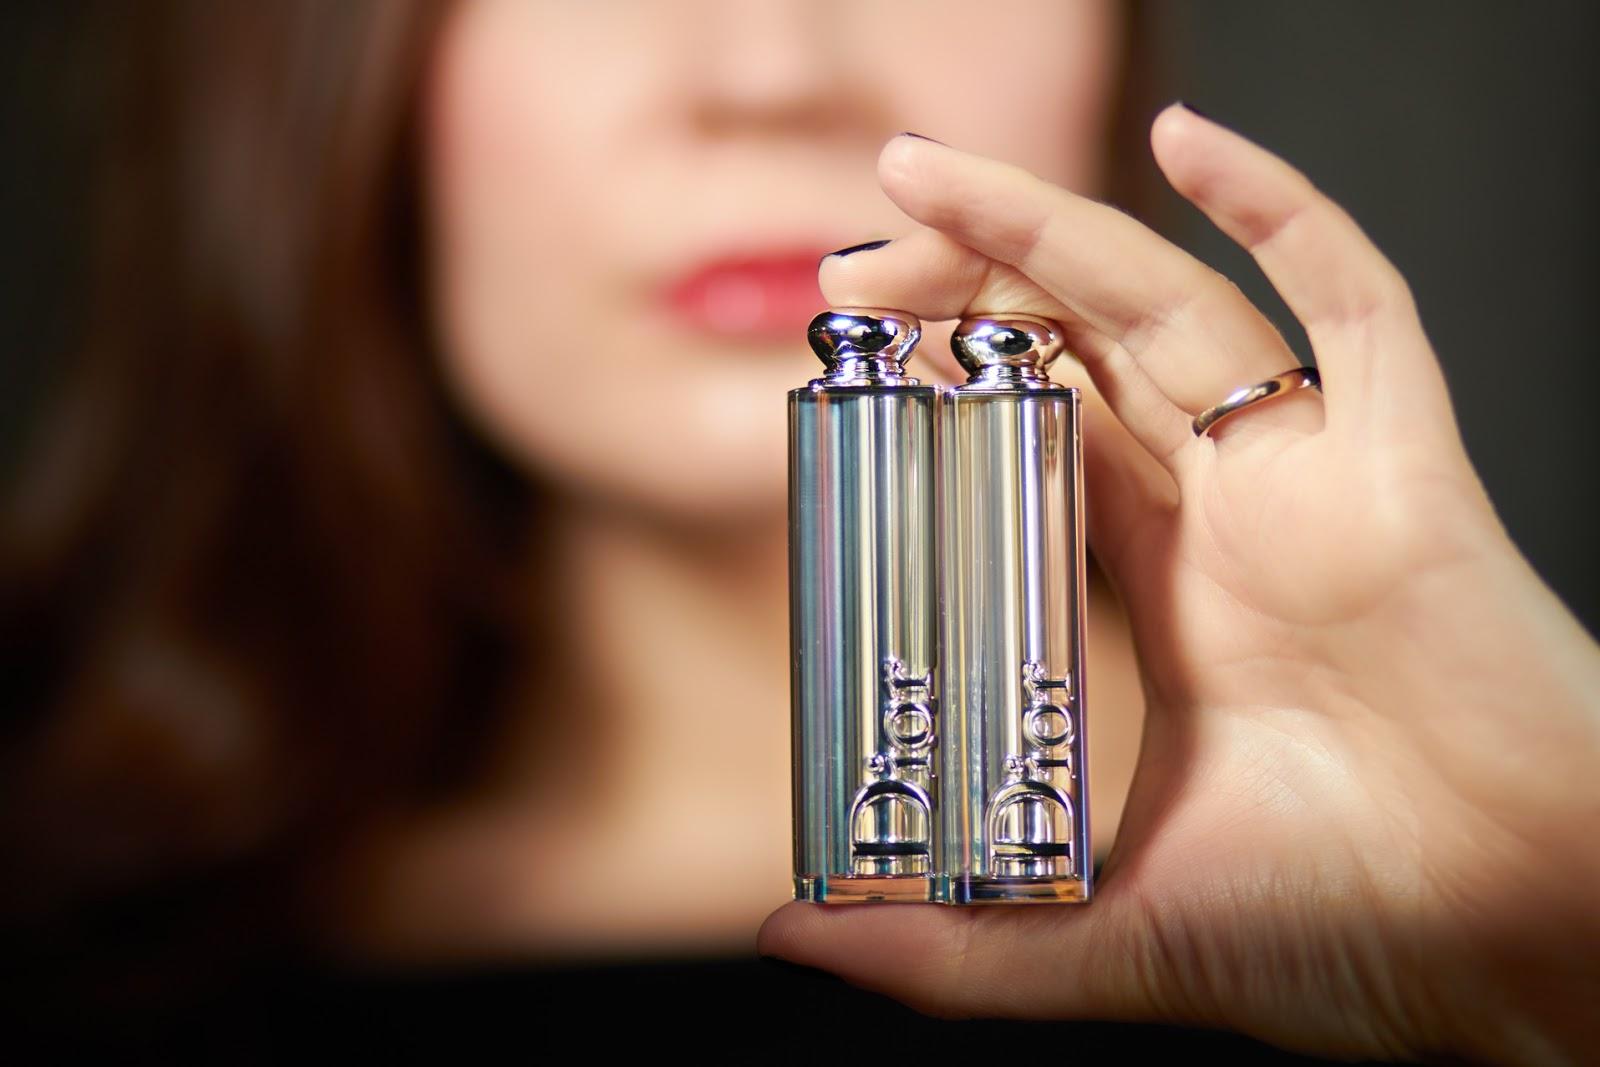 dior addict lipstick avis test nouvelle formule